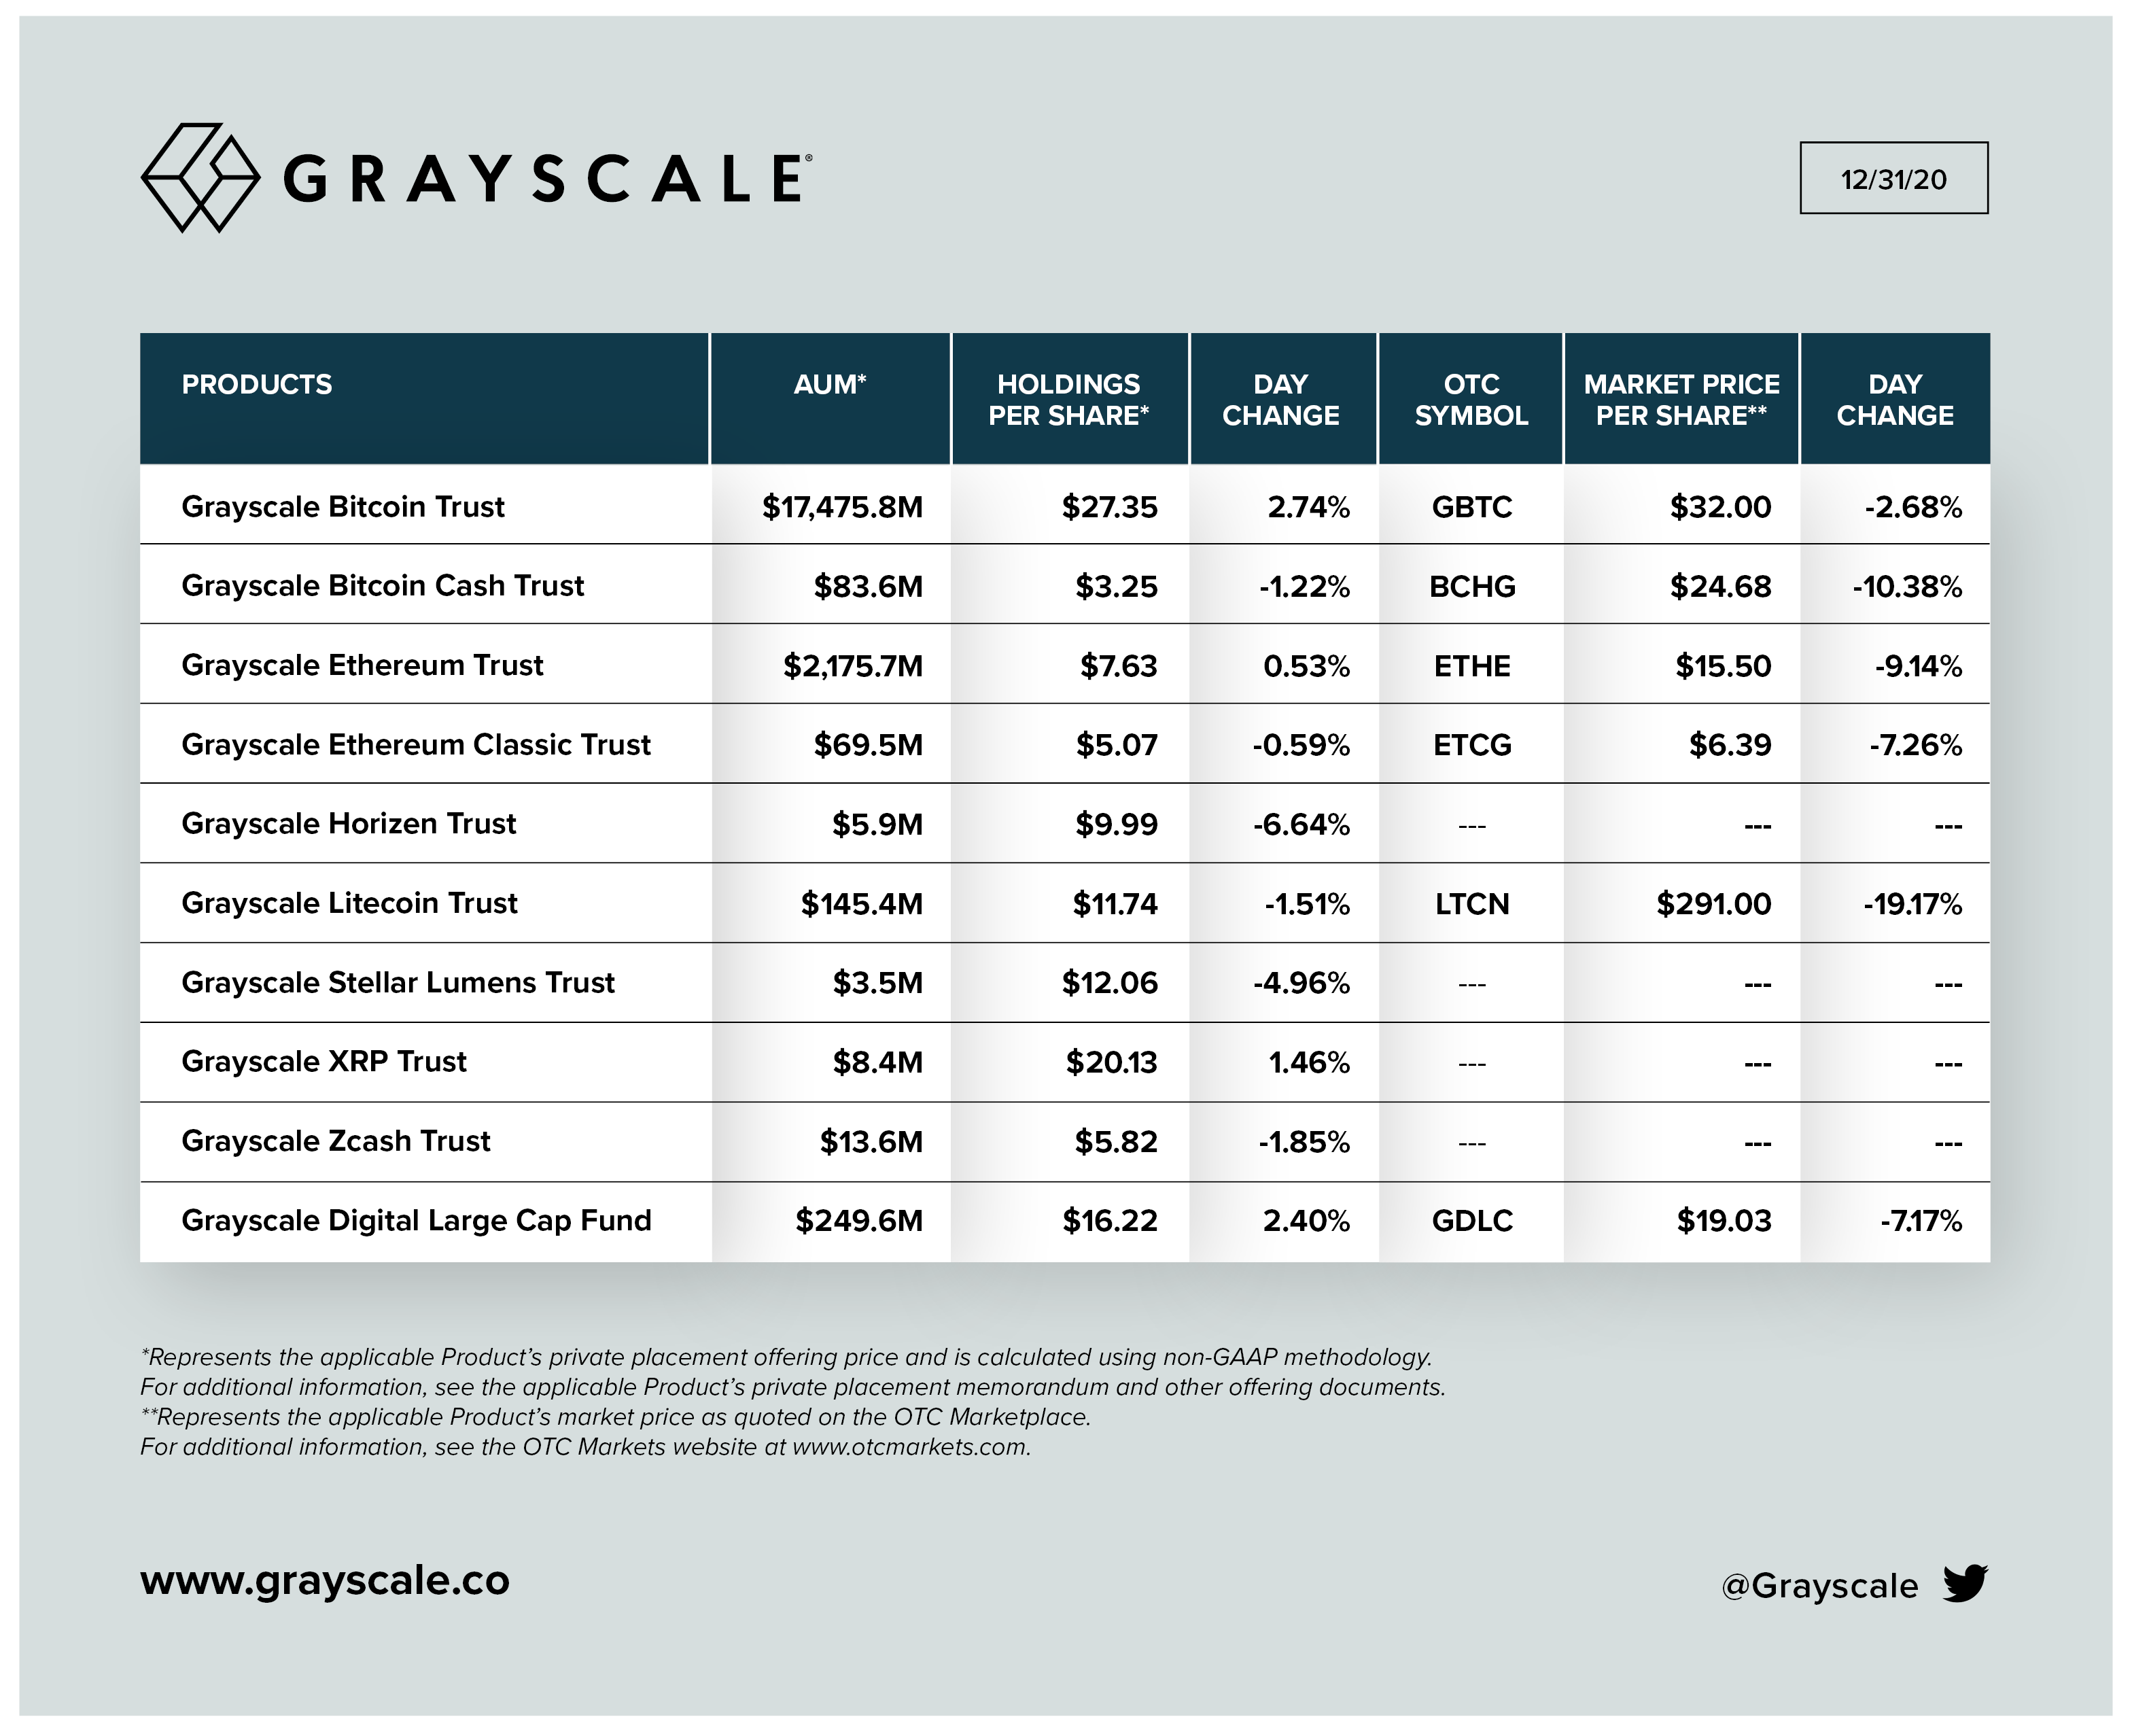 Grayscale時価総額